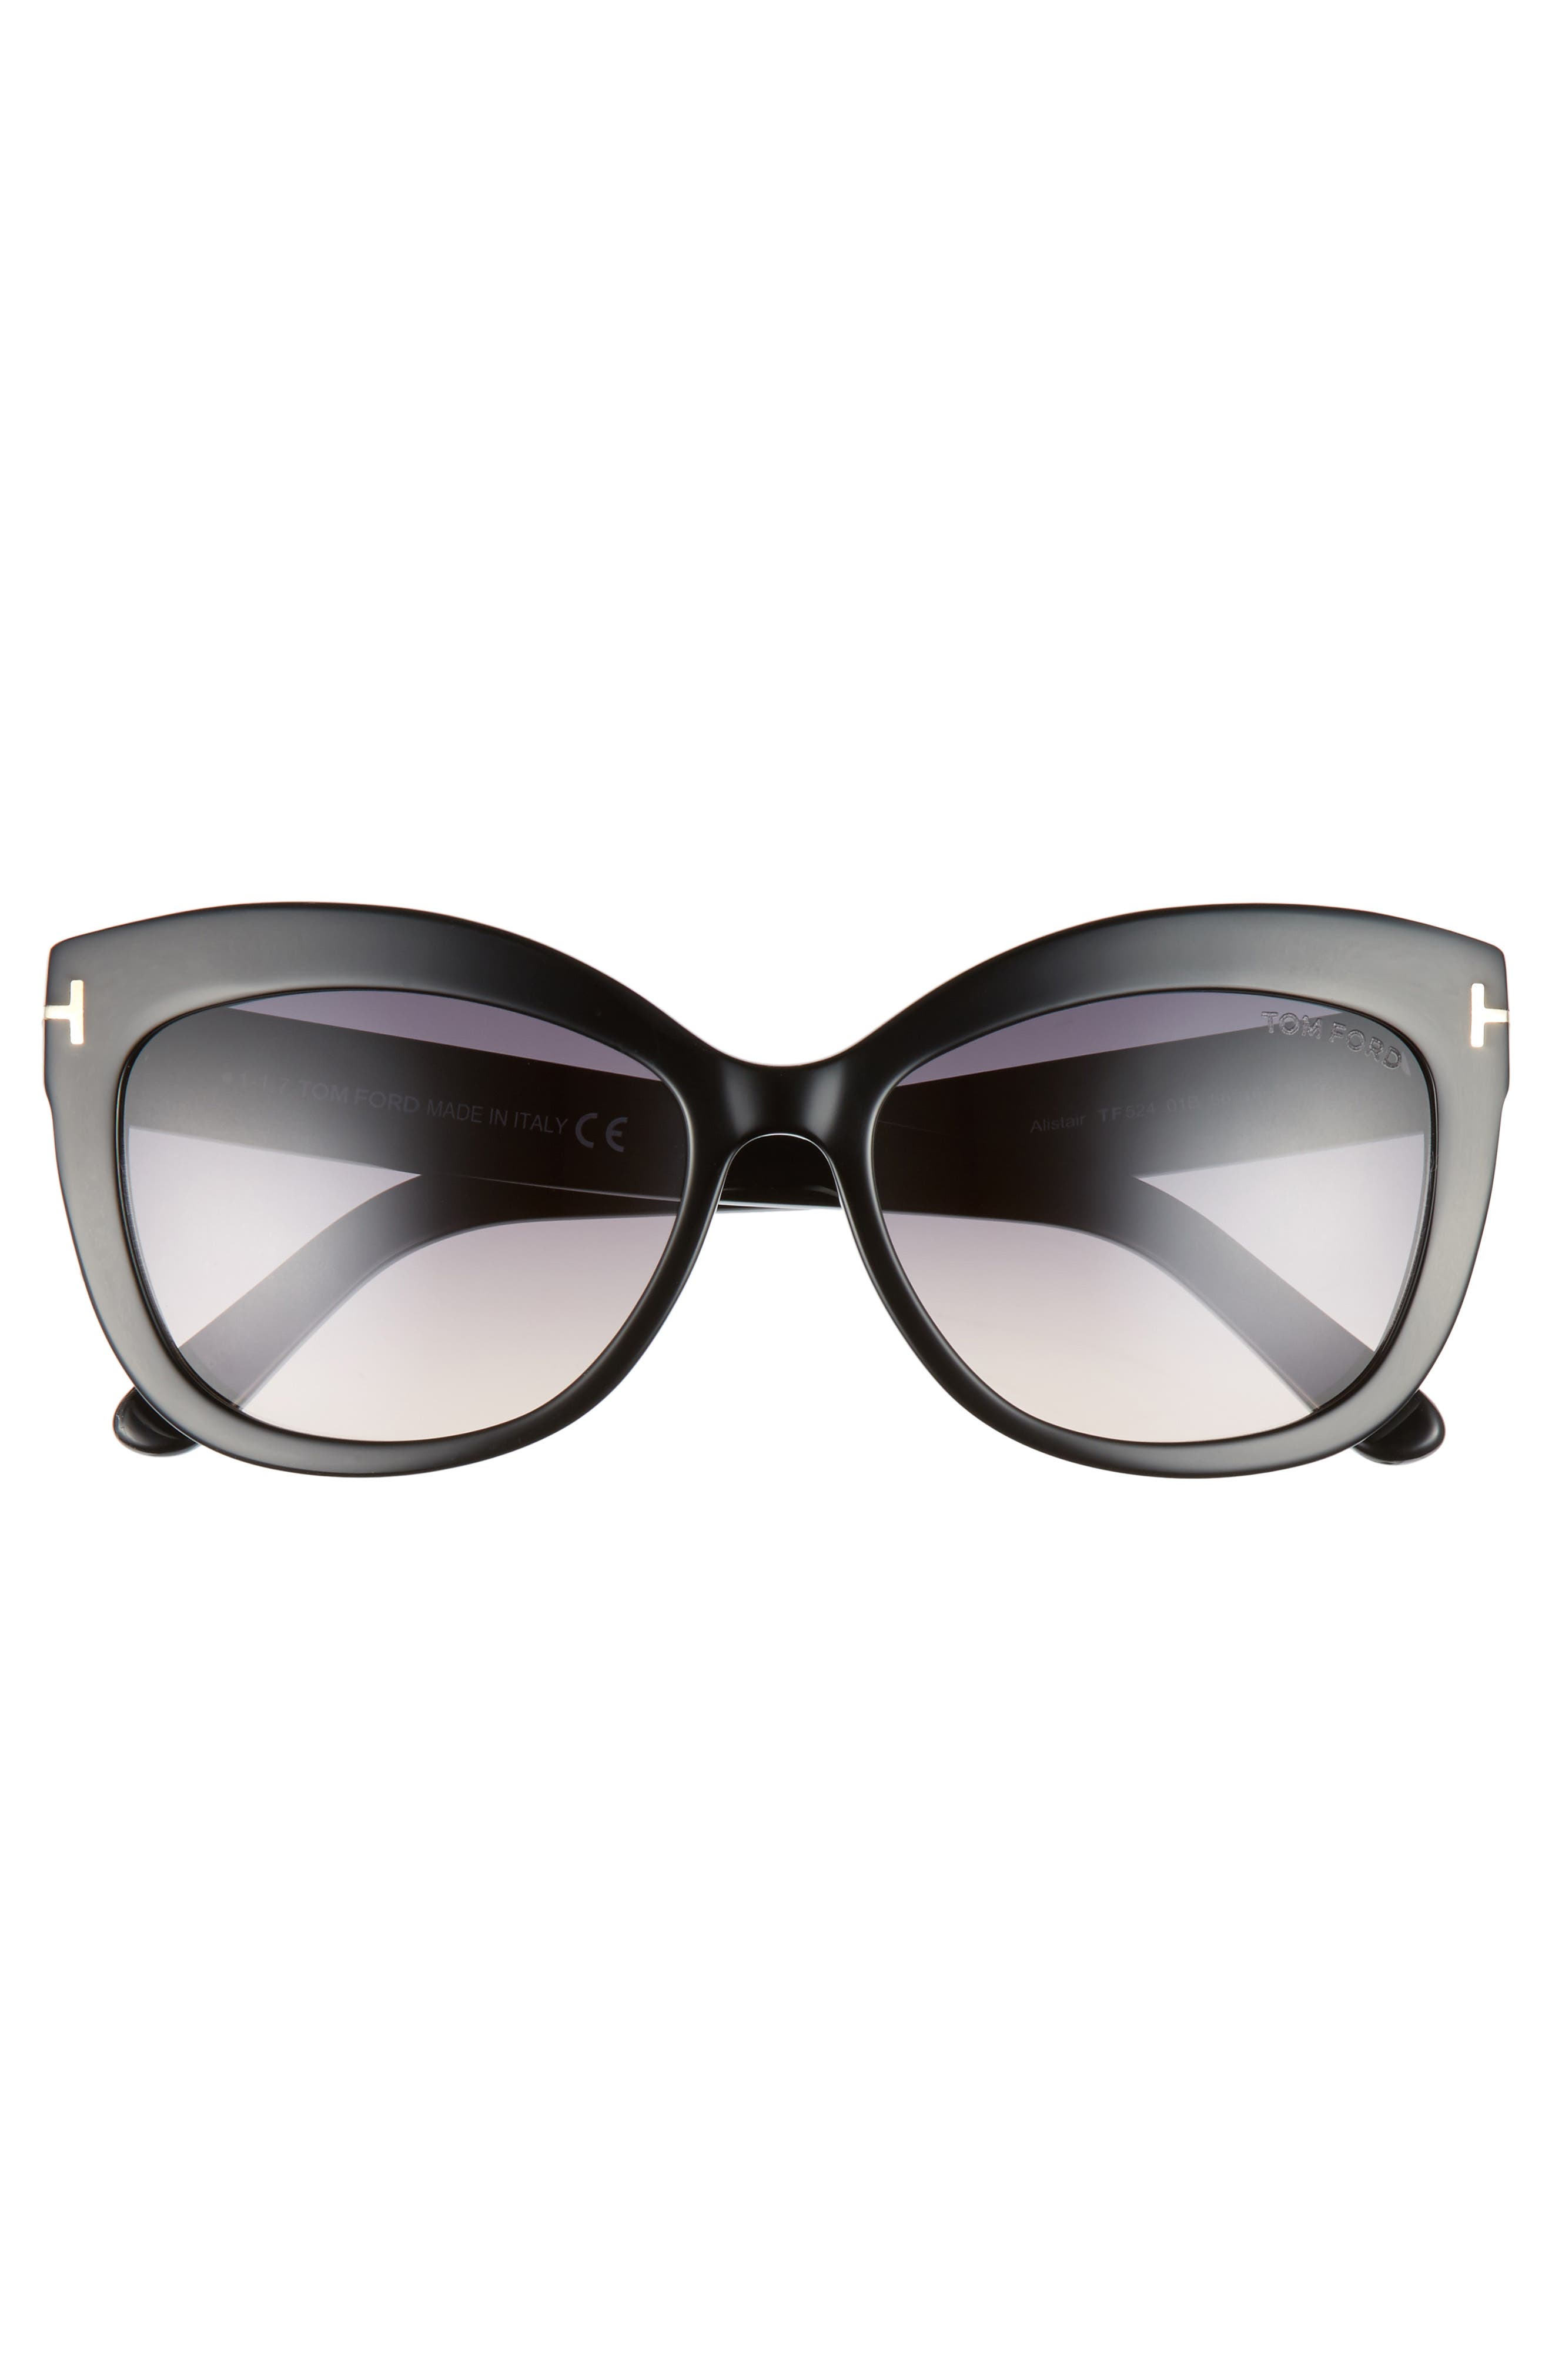 Alistair 56mm Gradient Sunglasses,                             Alternate thumbnail 3, color,                             SHINY BLACK / GRADIENT SMOKE